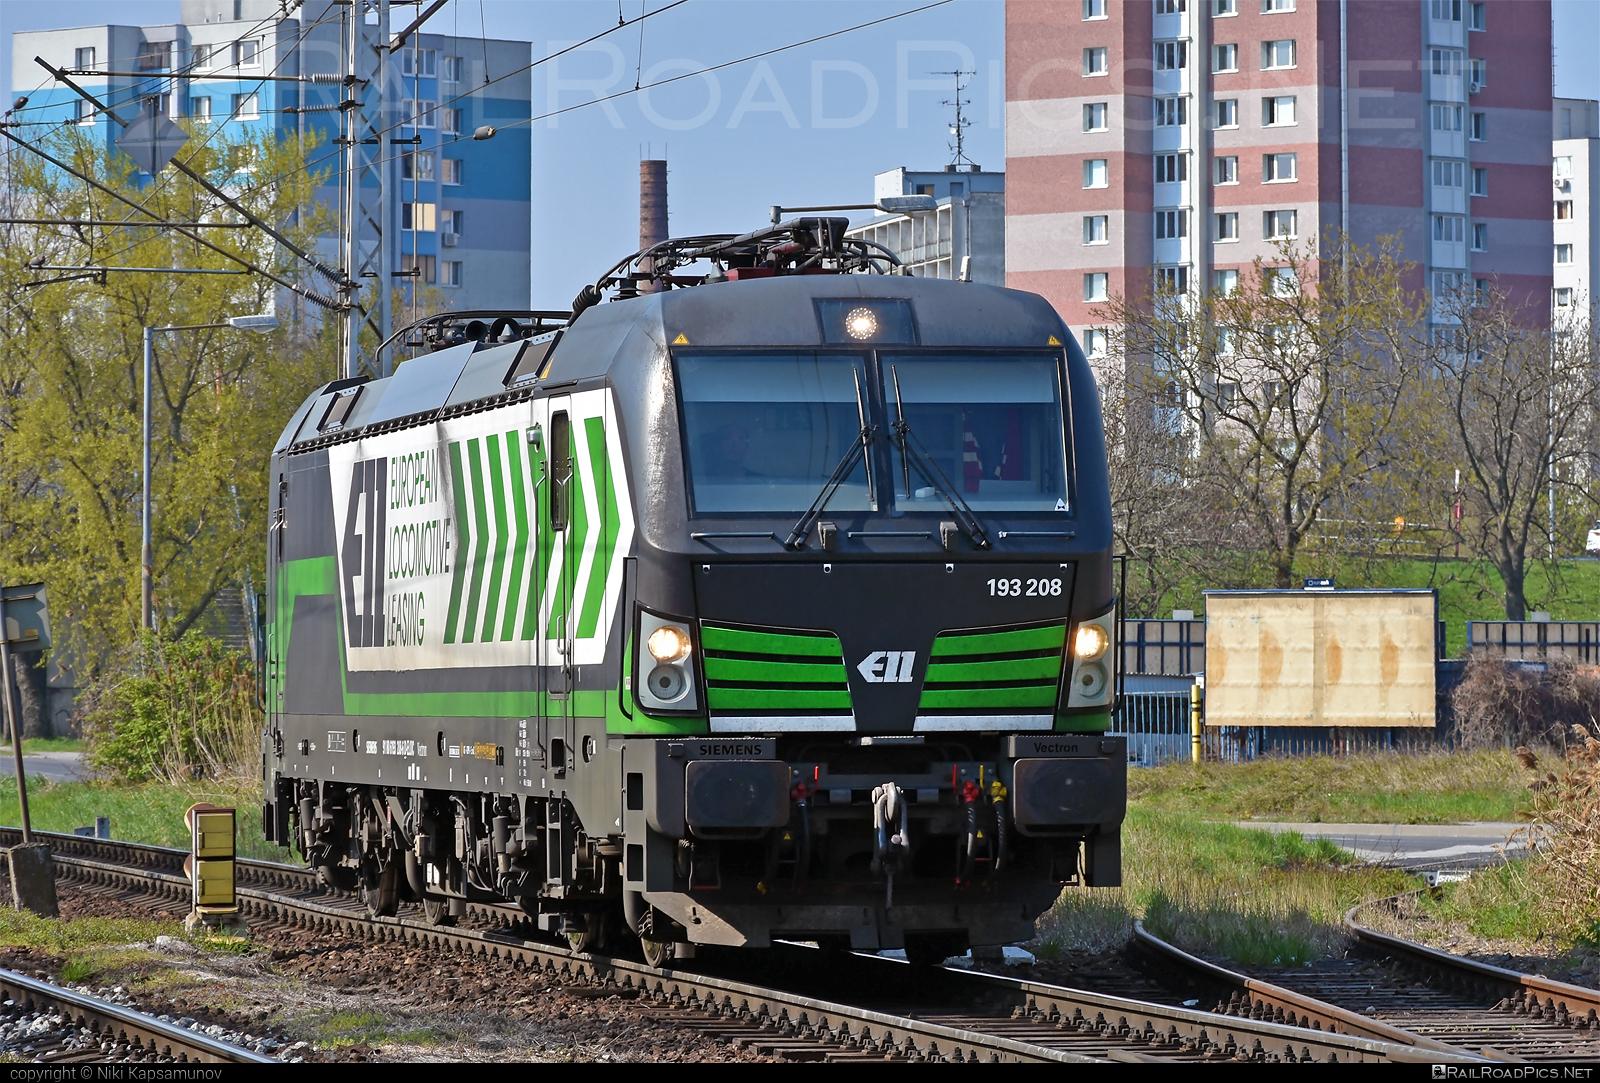 Siemens Vectron AC - 193 208 operated by FRACHTbahn Traktion GmbH #ell #ellgermany #eloc #europeanlocomotiveleasing #frachtbahn #frachtbahntraktion #frachtbahntraktiongmbh #siemens #siemensvectron #siemensvectronac #vectron #vectronac